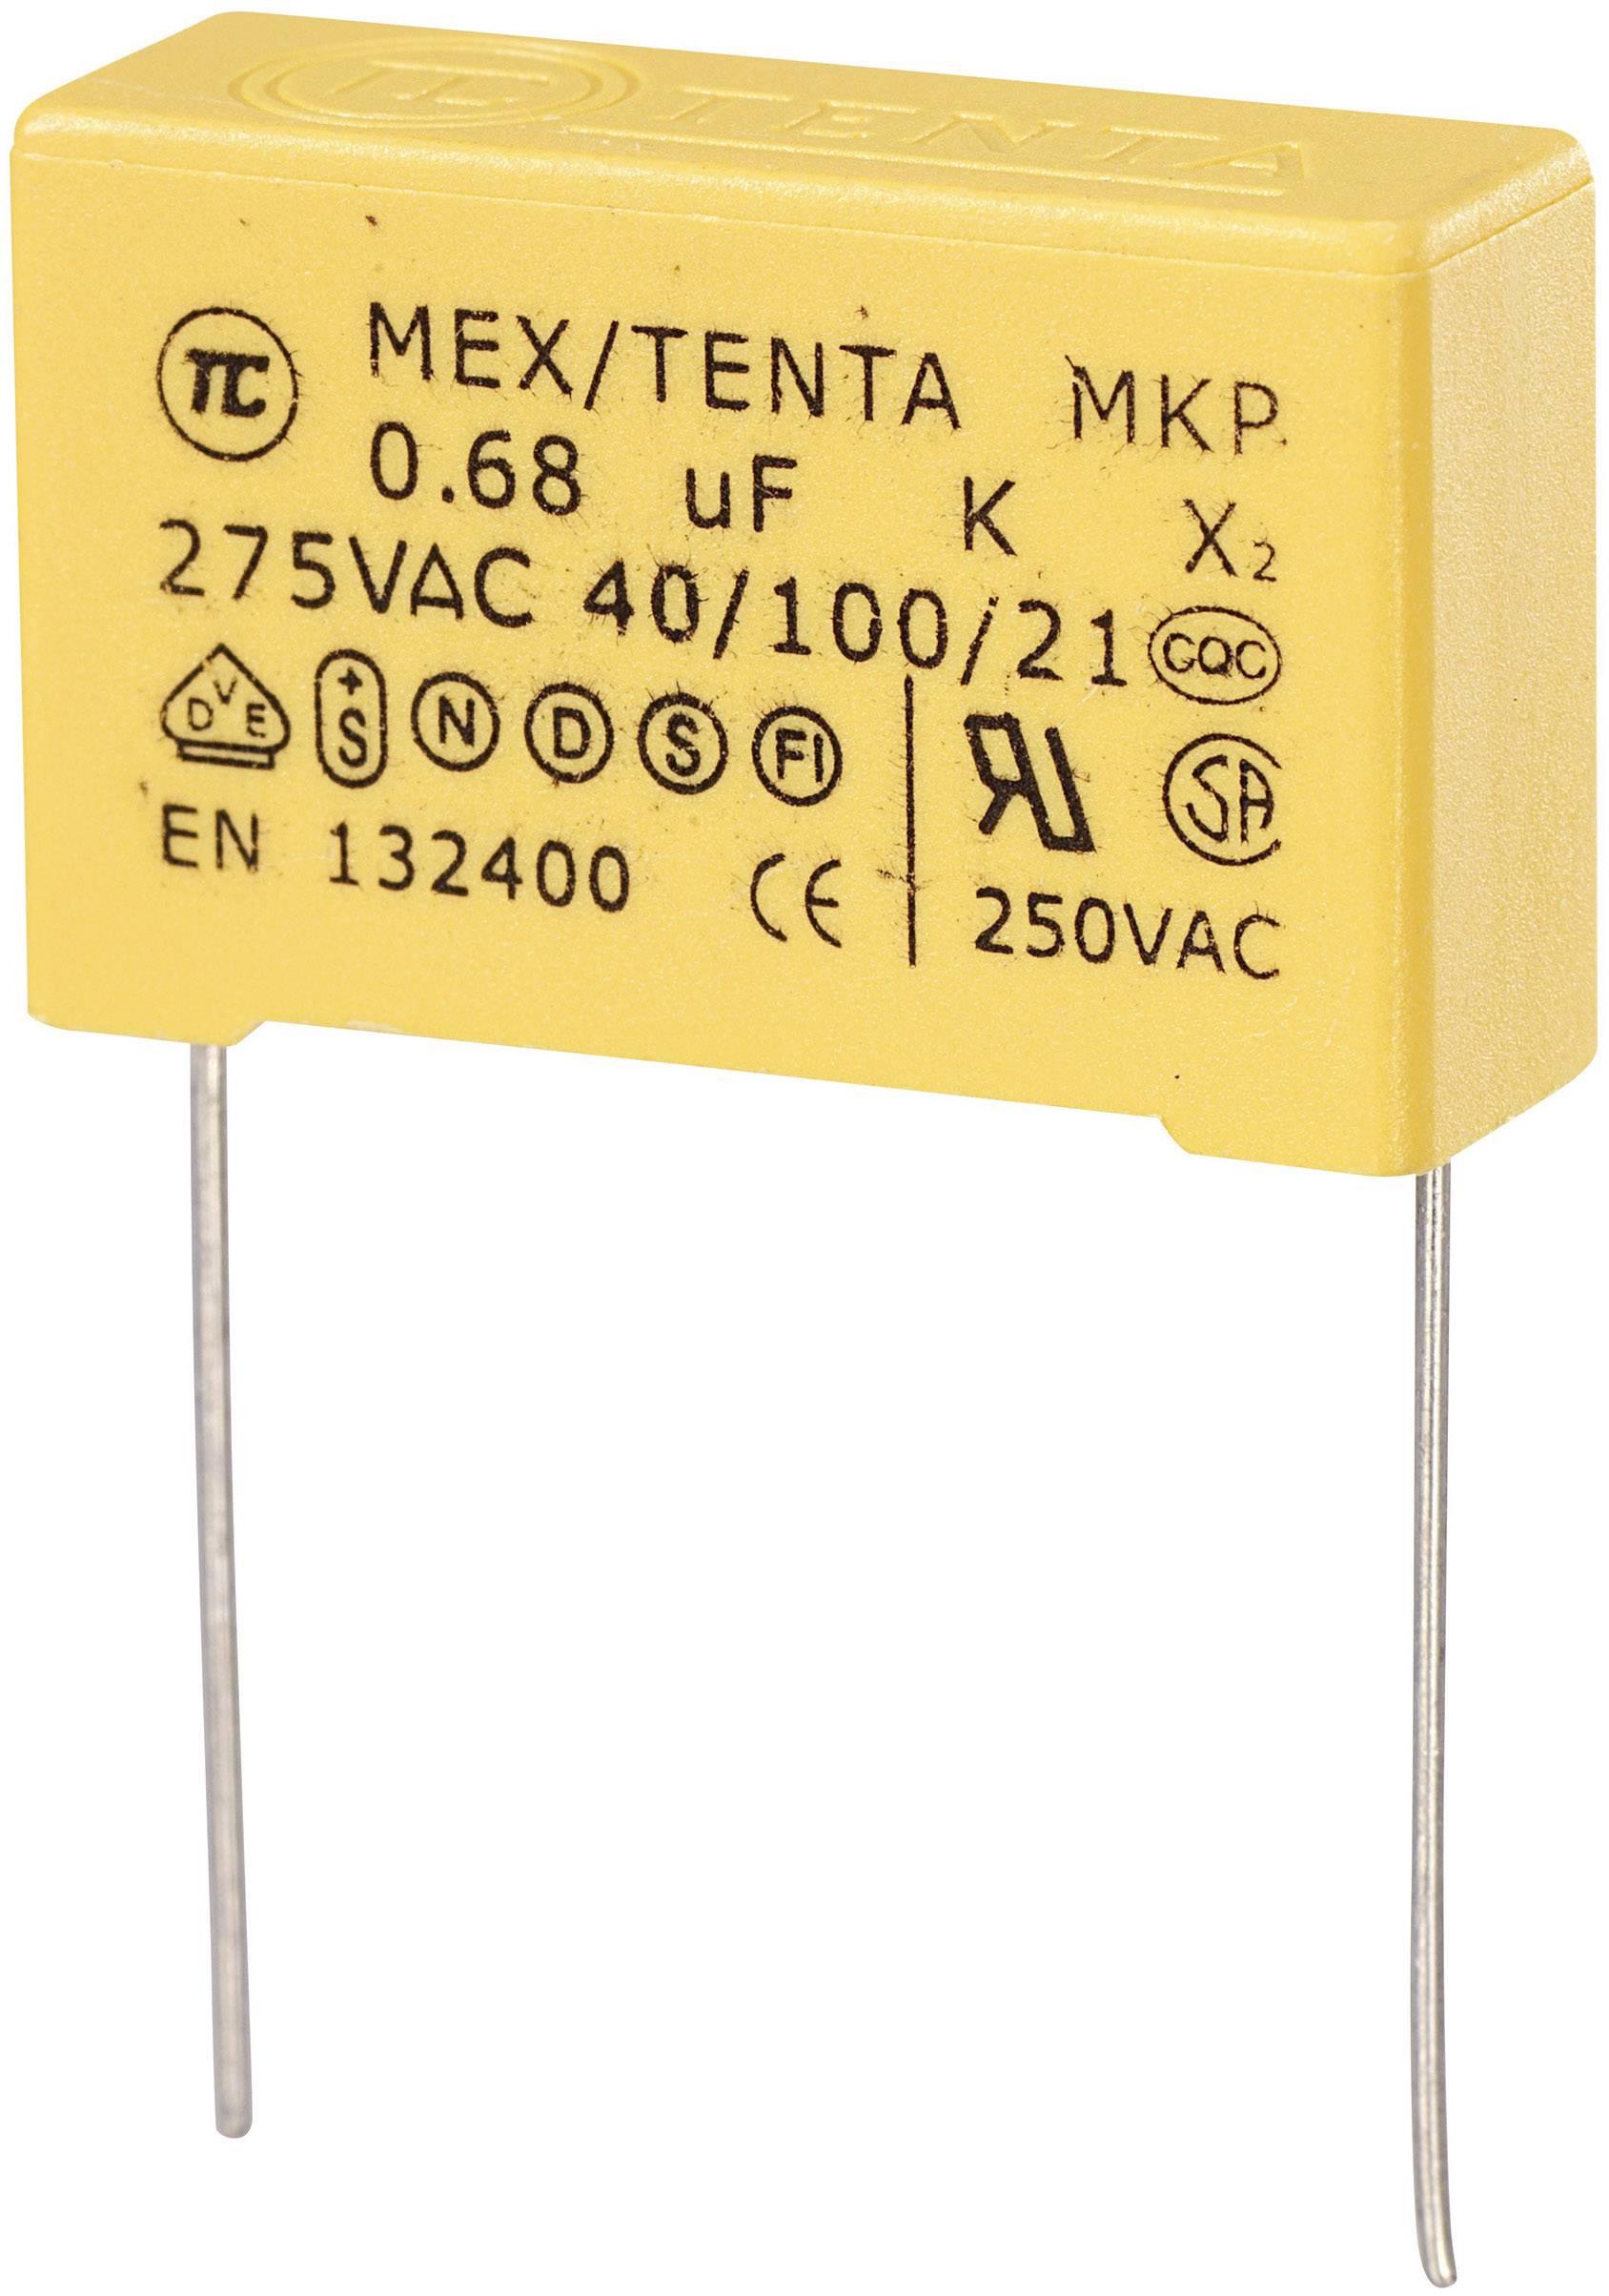 Foliový kondenzátor MKP, 0,56 µF, X2 275 V/AC, 10 %, 30 x 11 x 20 mm